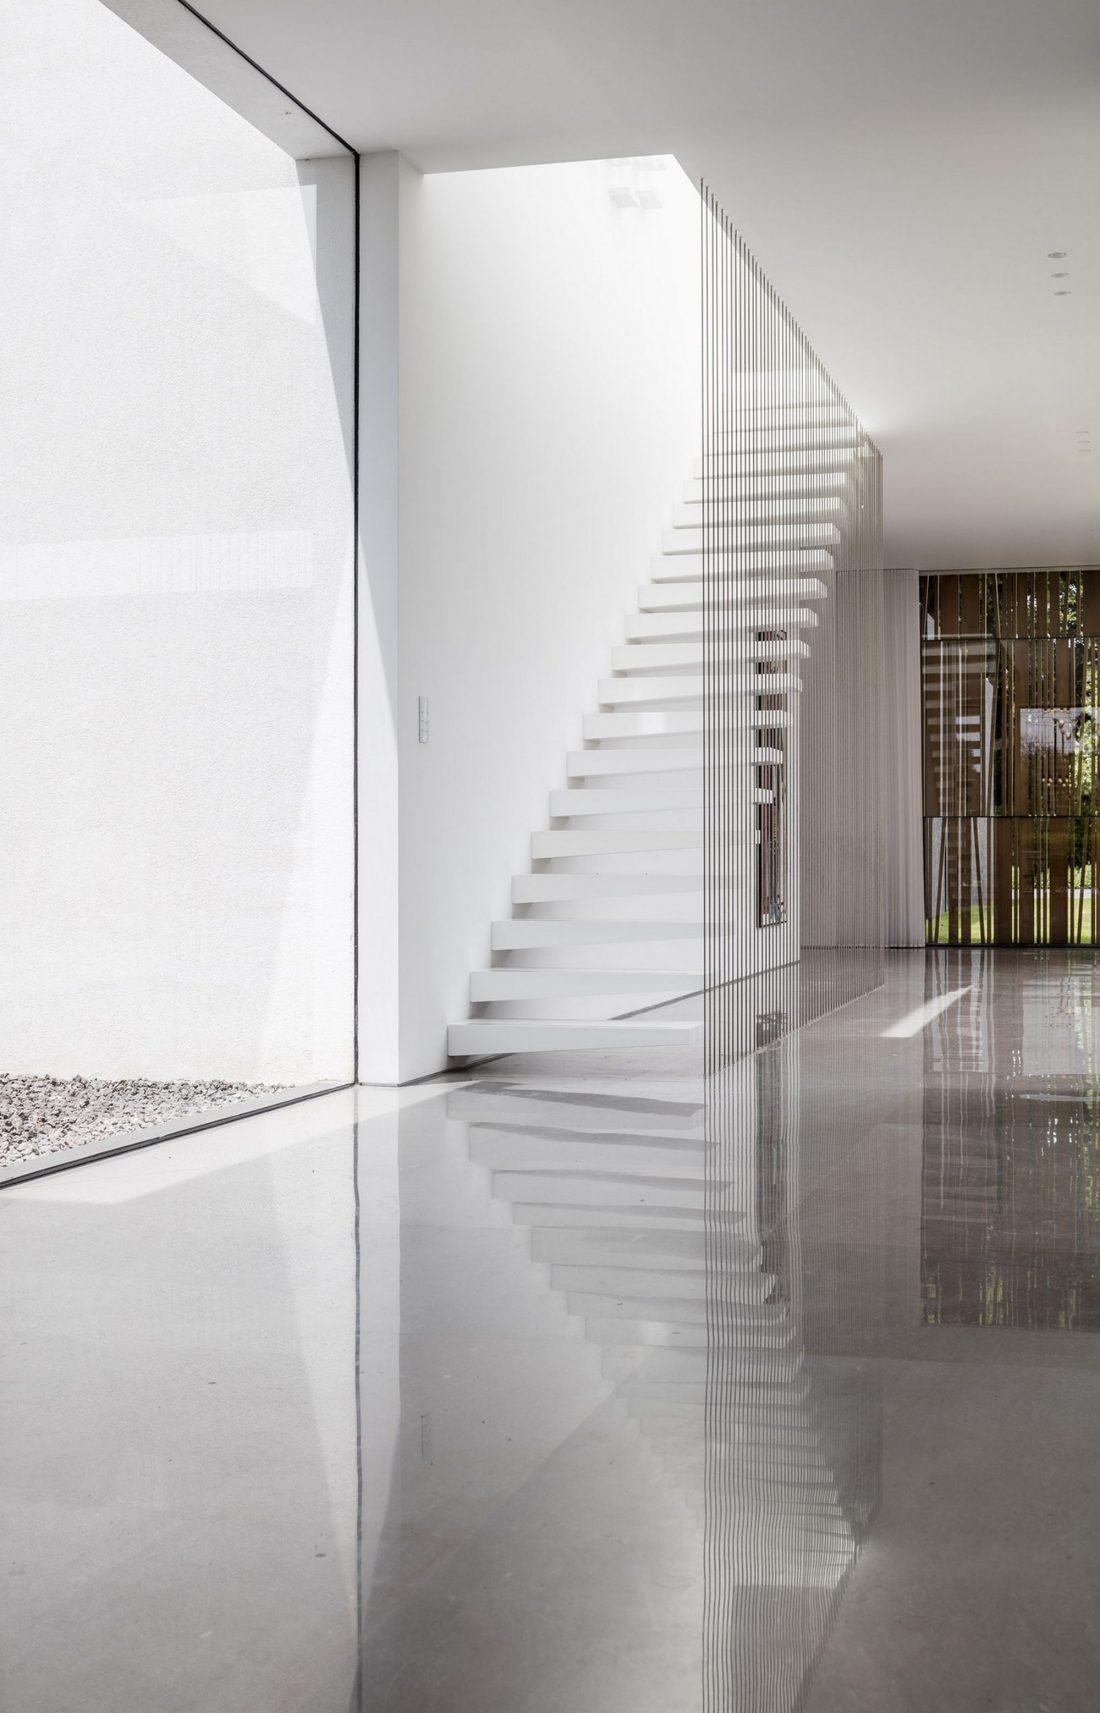 700-kvadratnyh-metrov-sveta-f-house-po-proektu-studii-pitsou-kedem-31